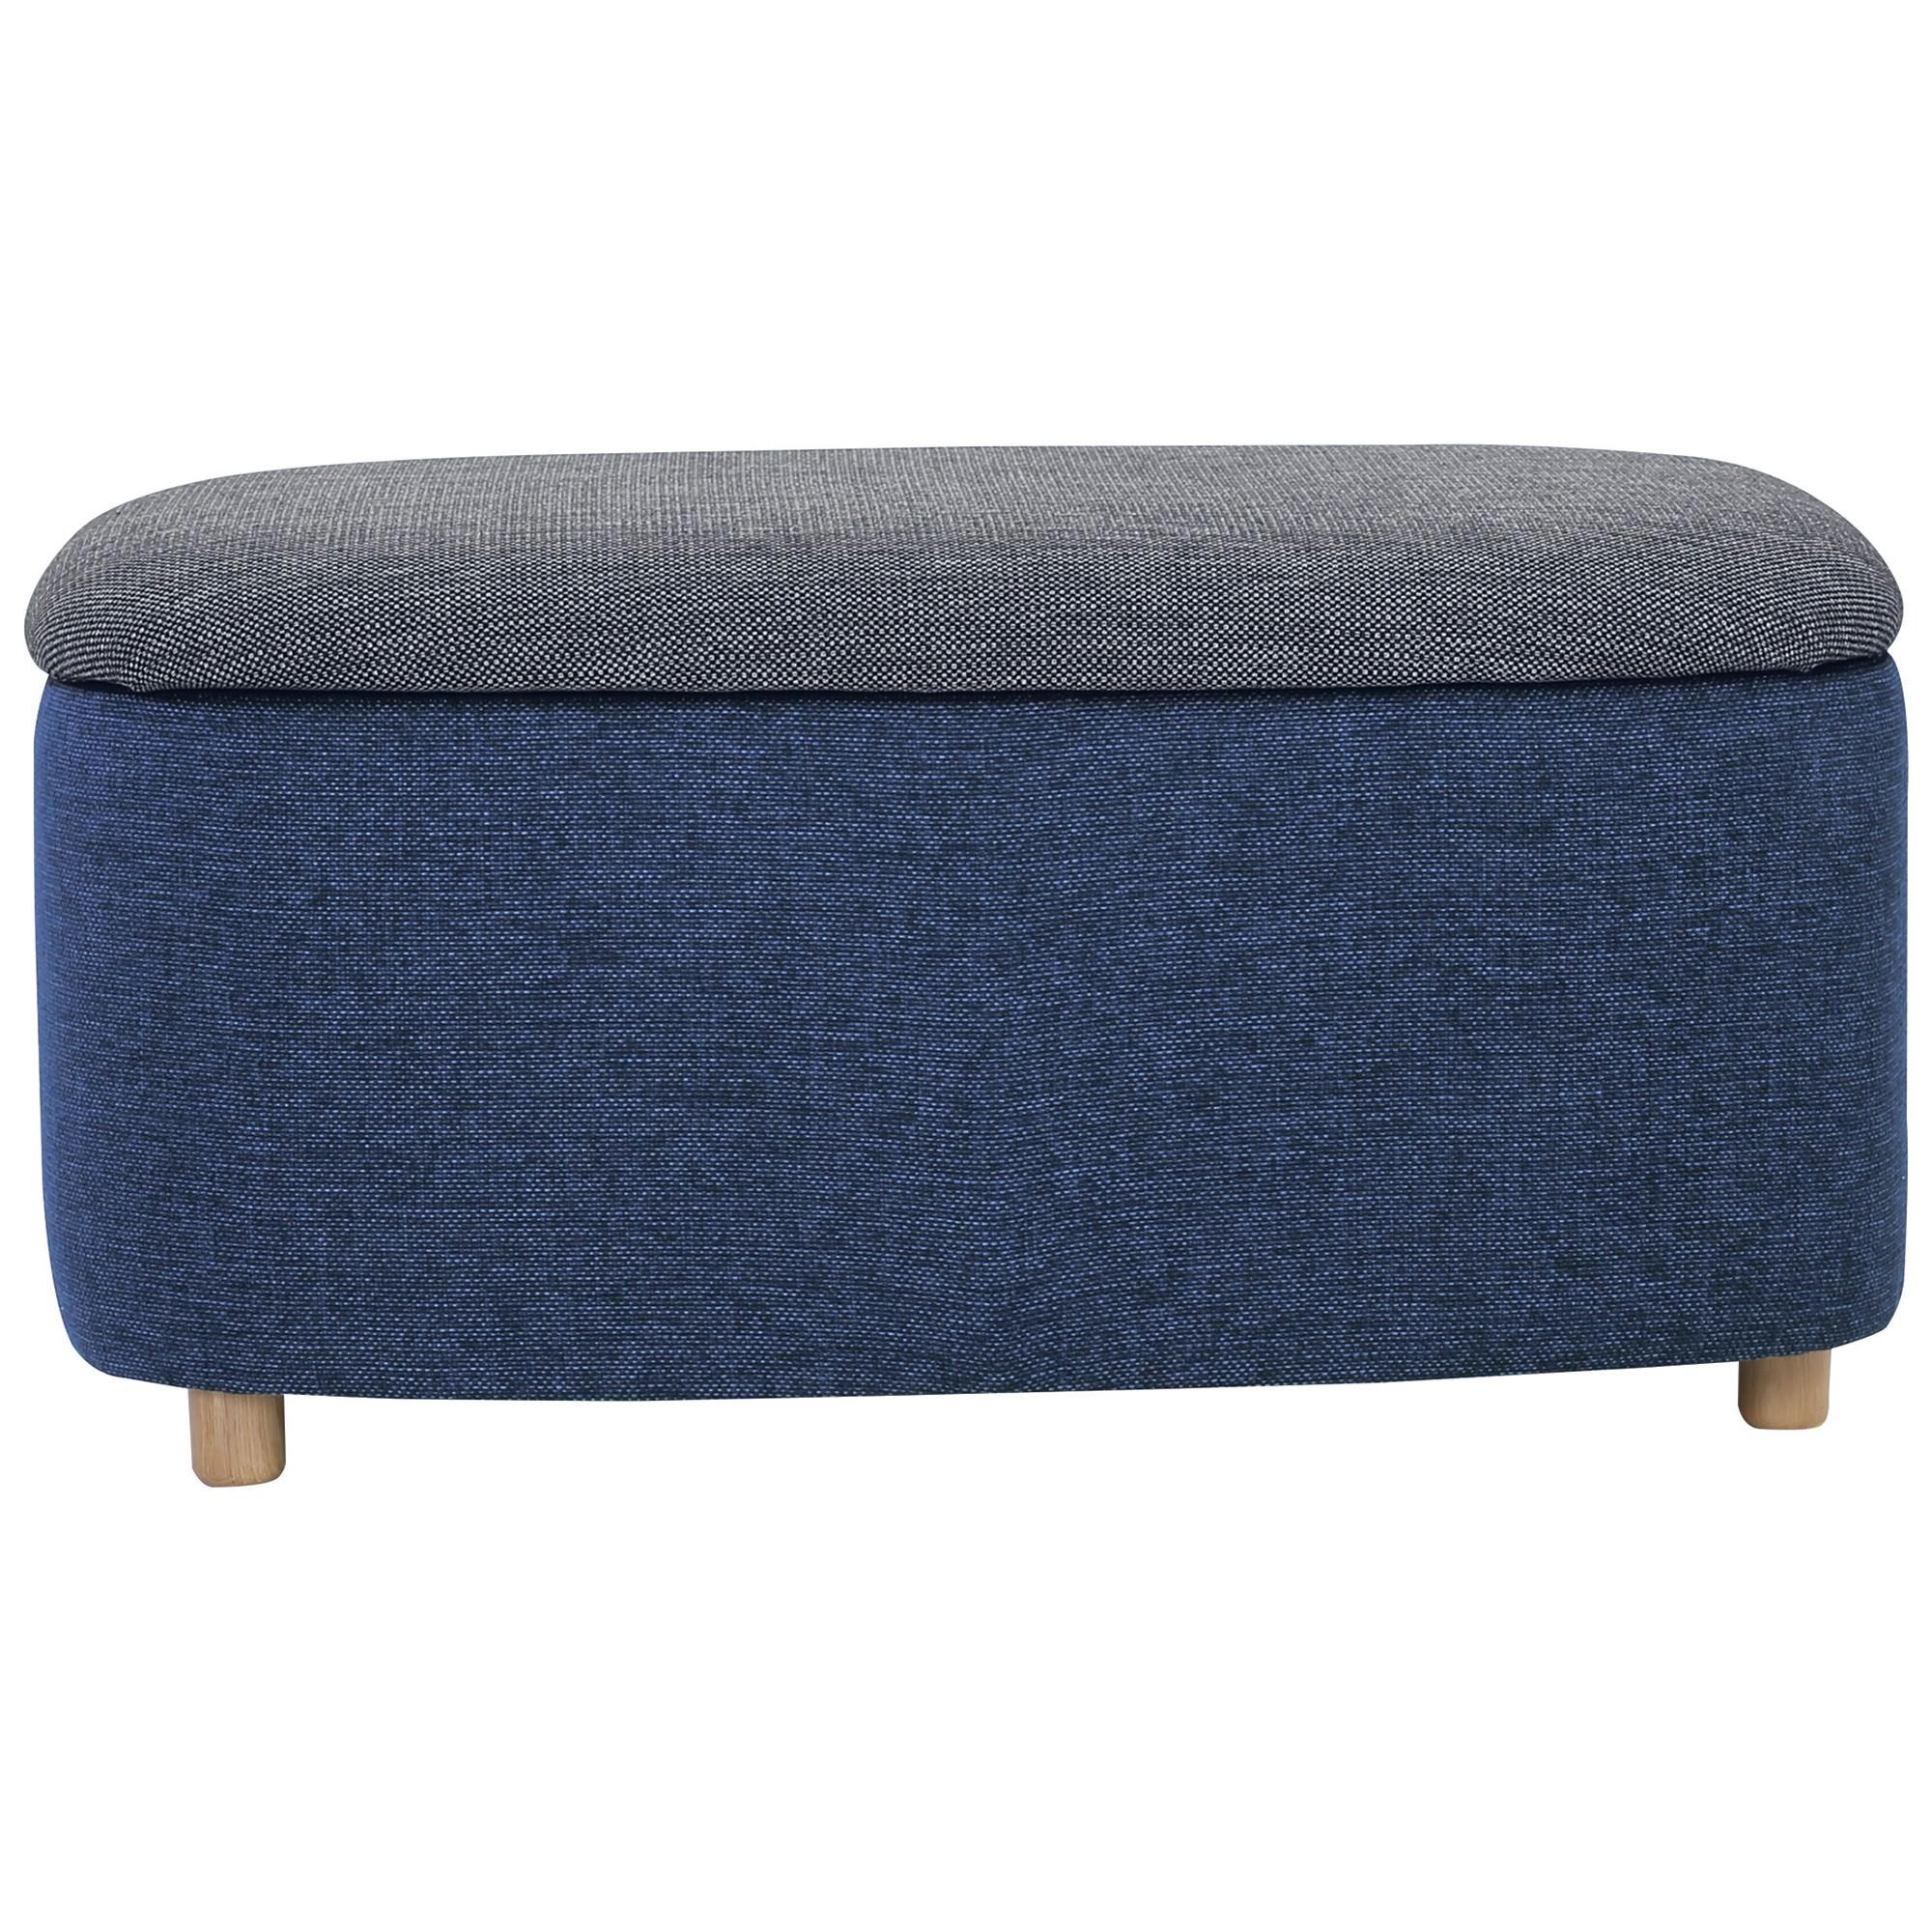 Daytona Fabric Ottoman, Large, Blue / Grey